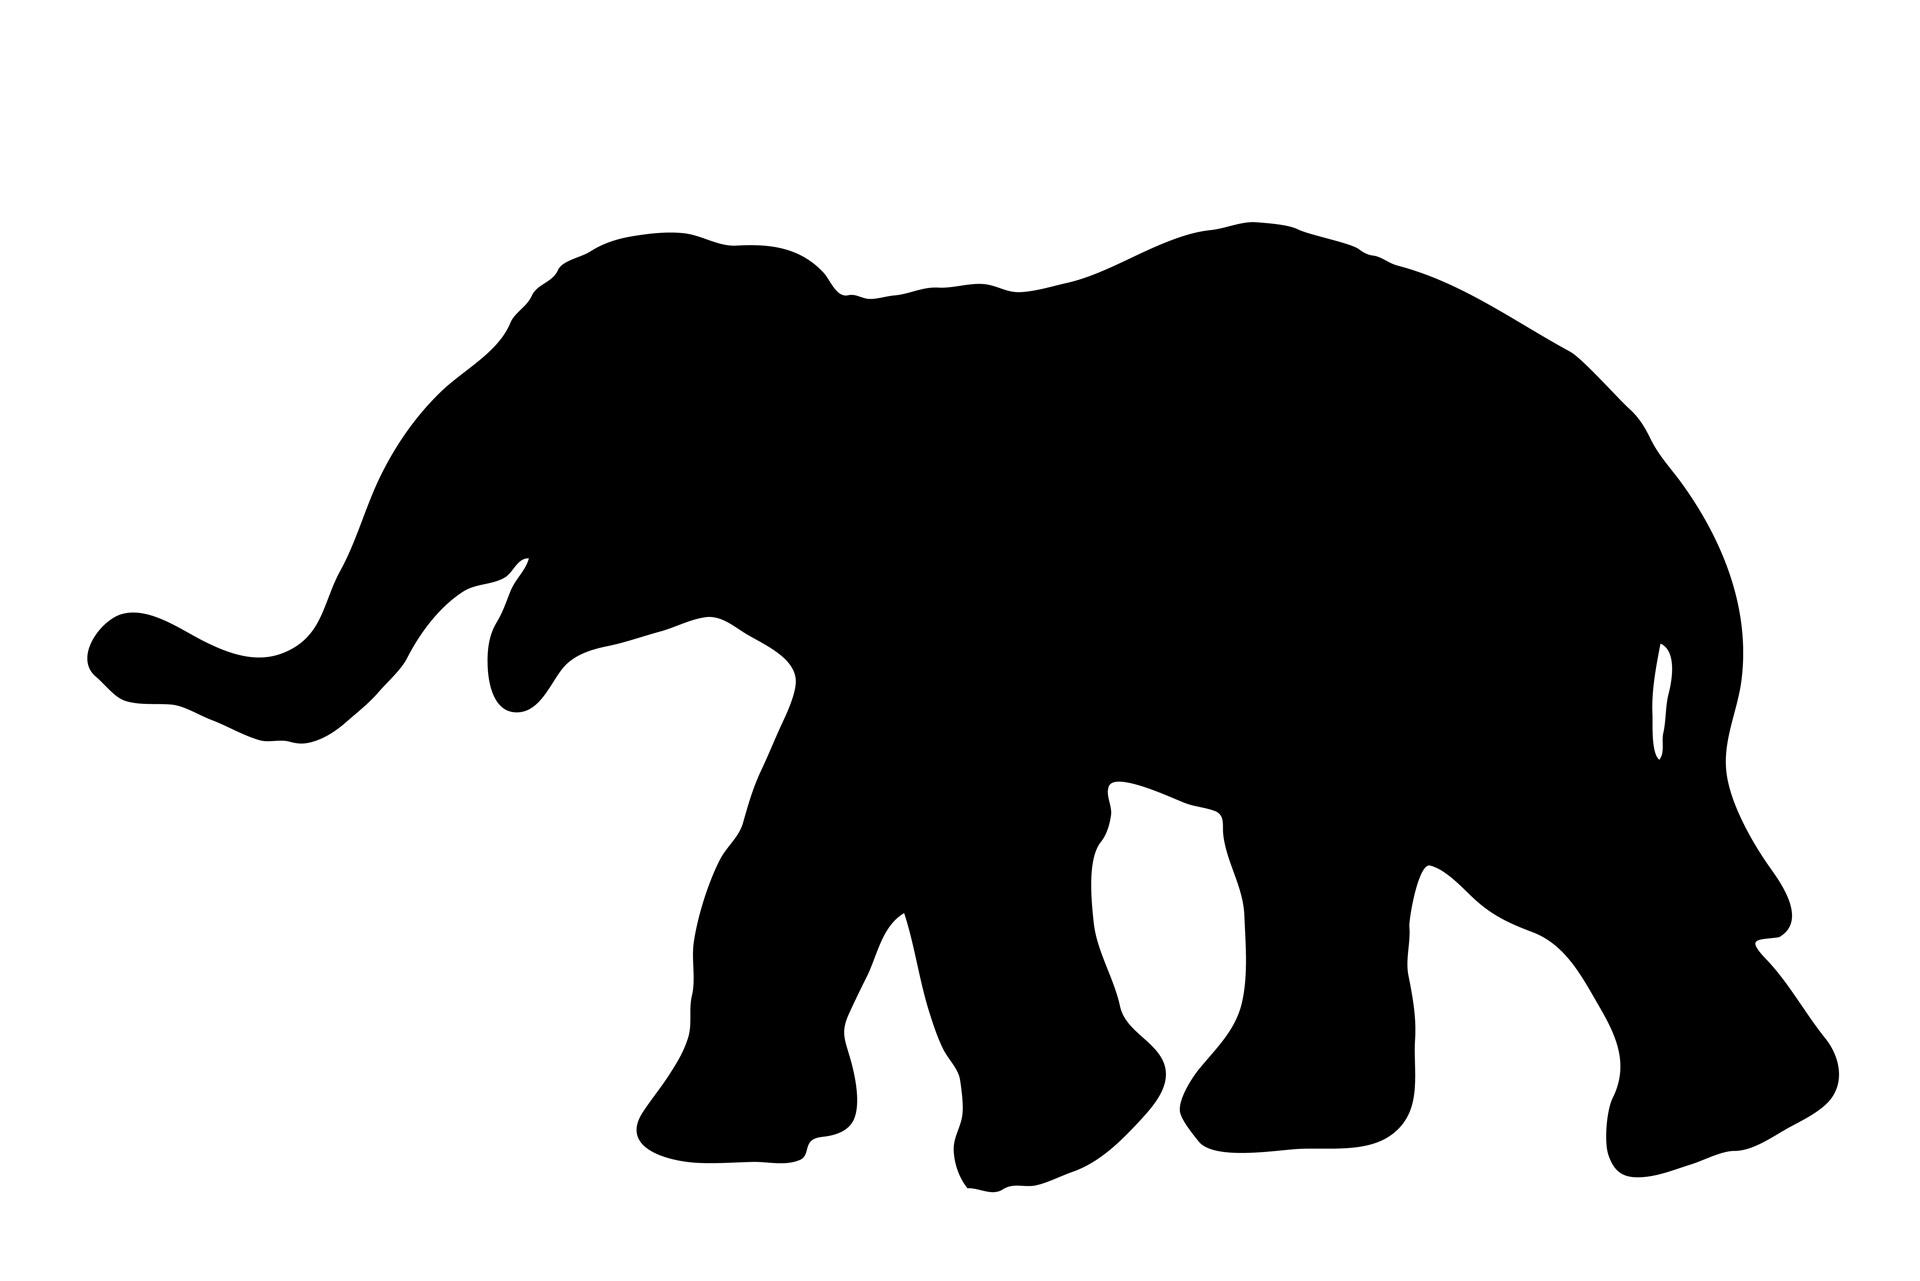 Elephant silhouette